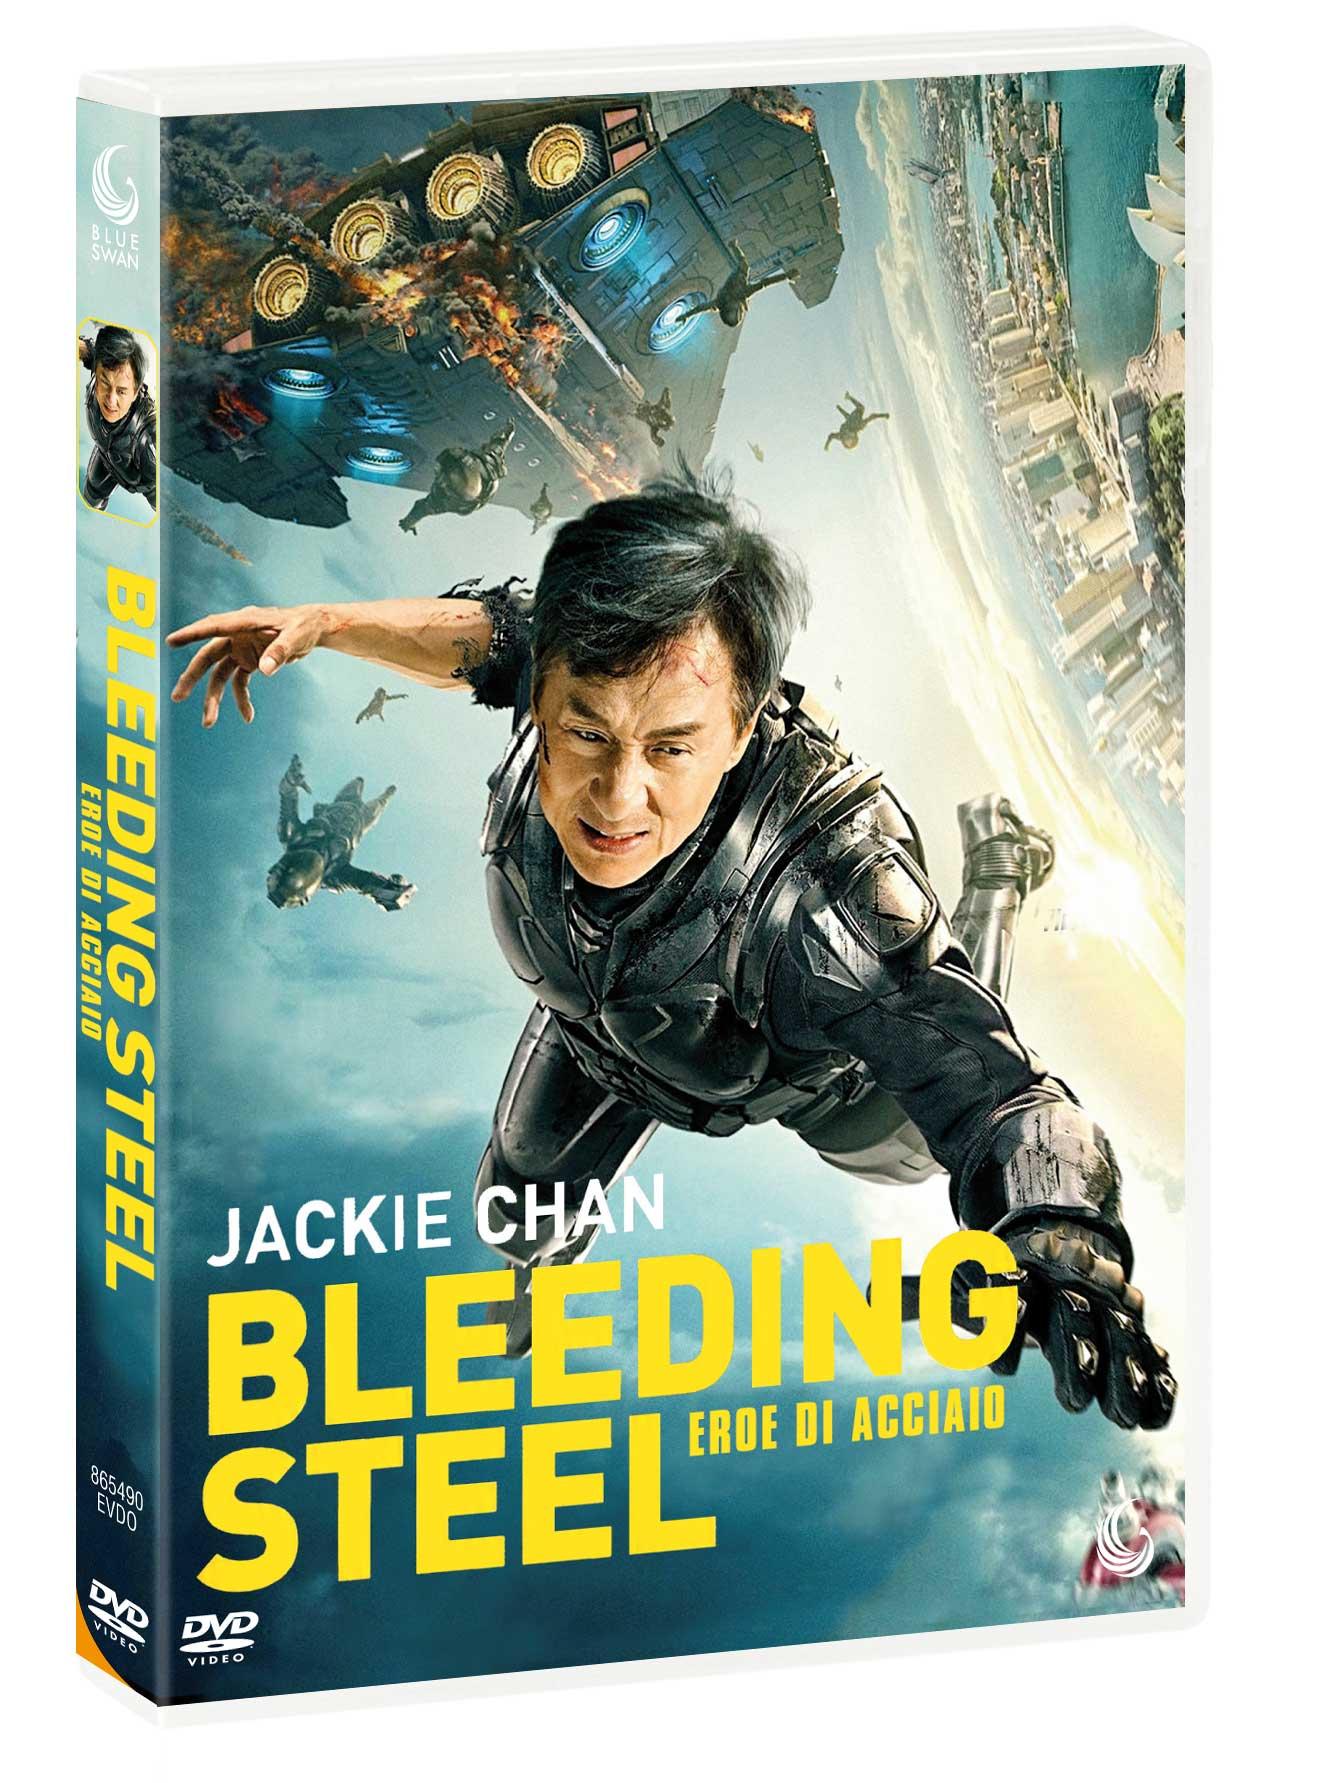 BLEEDING STEEL - EROE D'ACCIAIO (DVD)